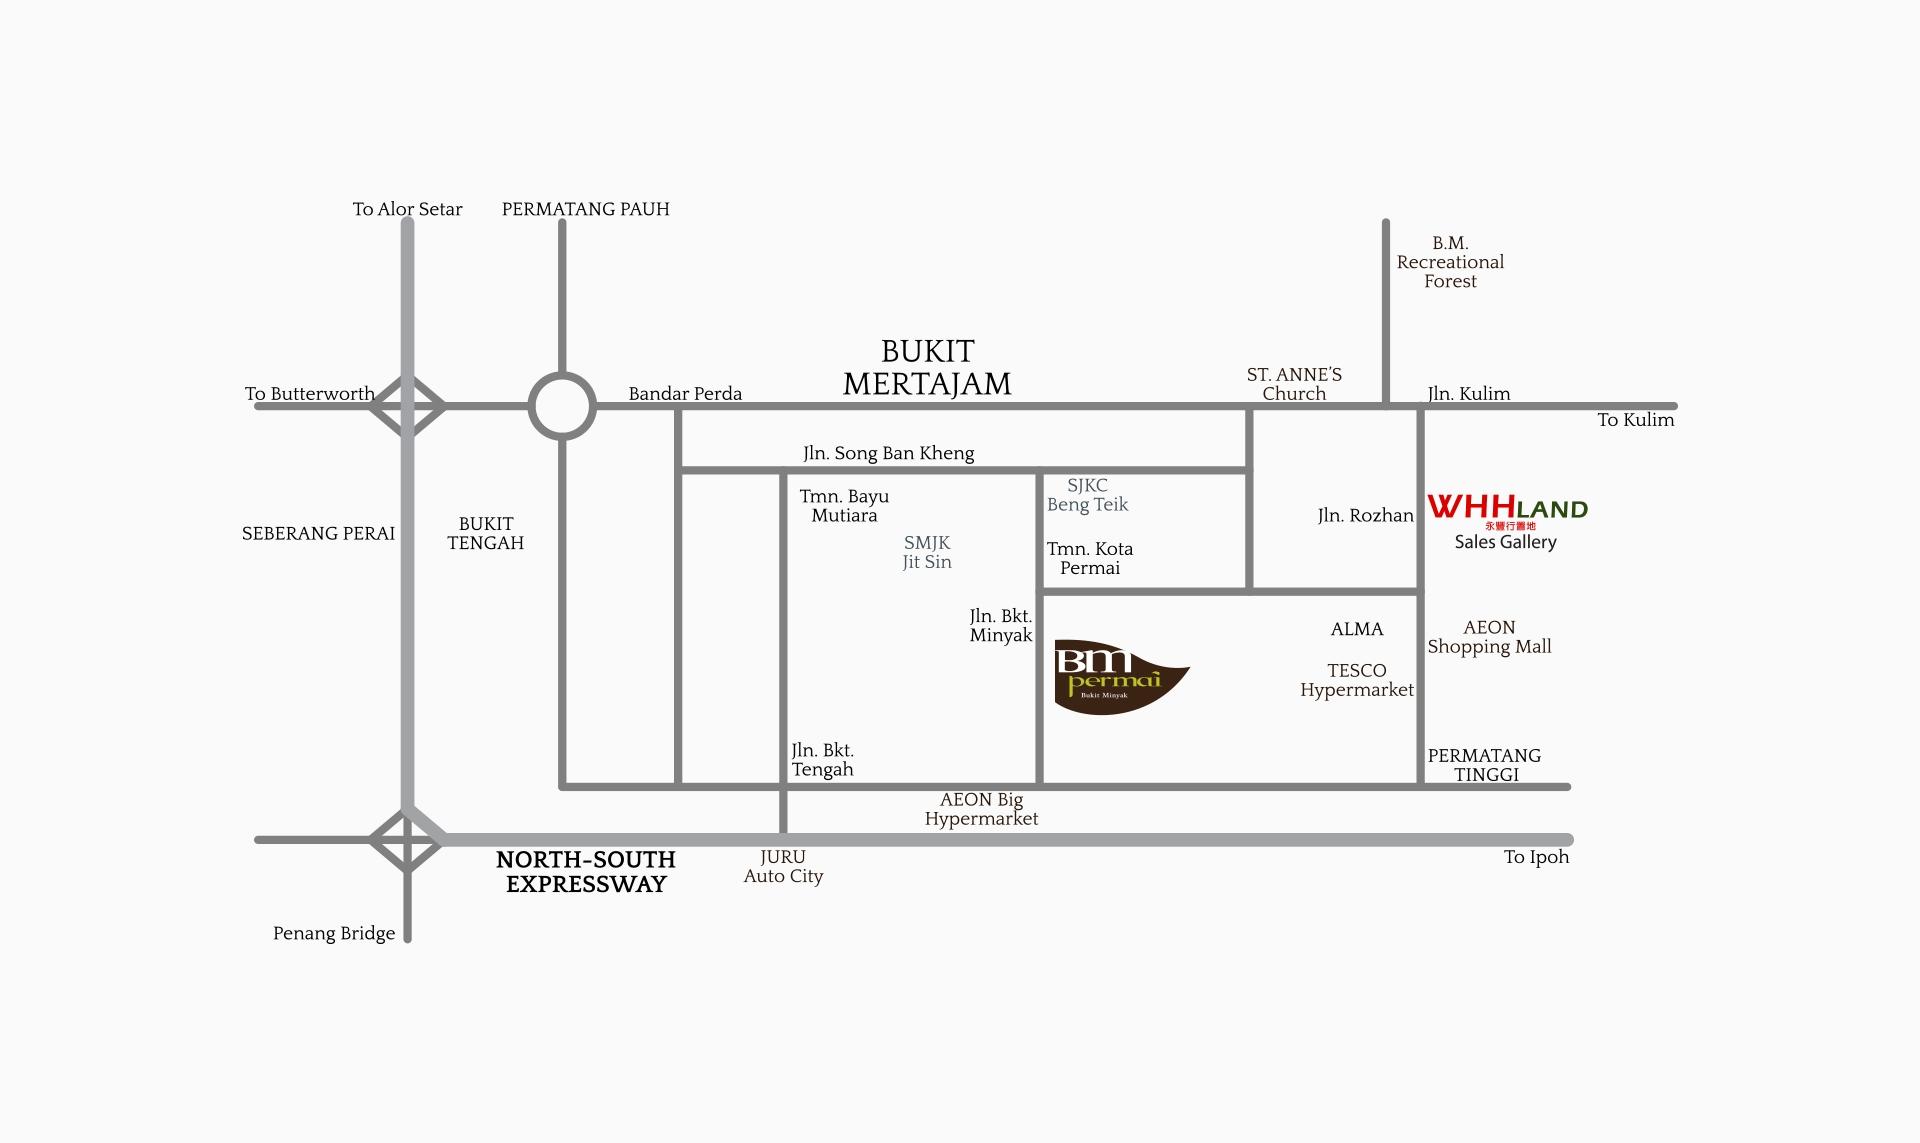 bm_permai_location_map